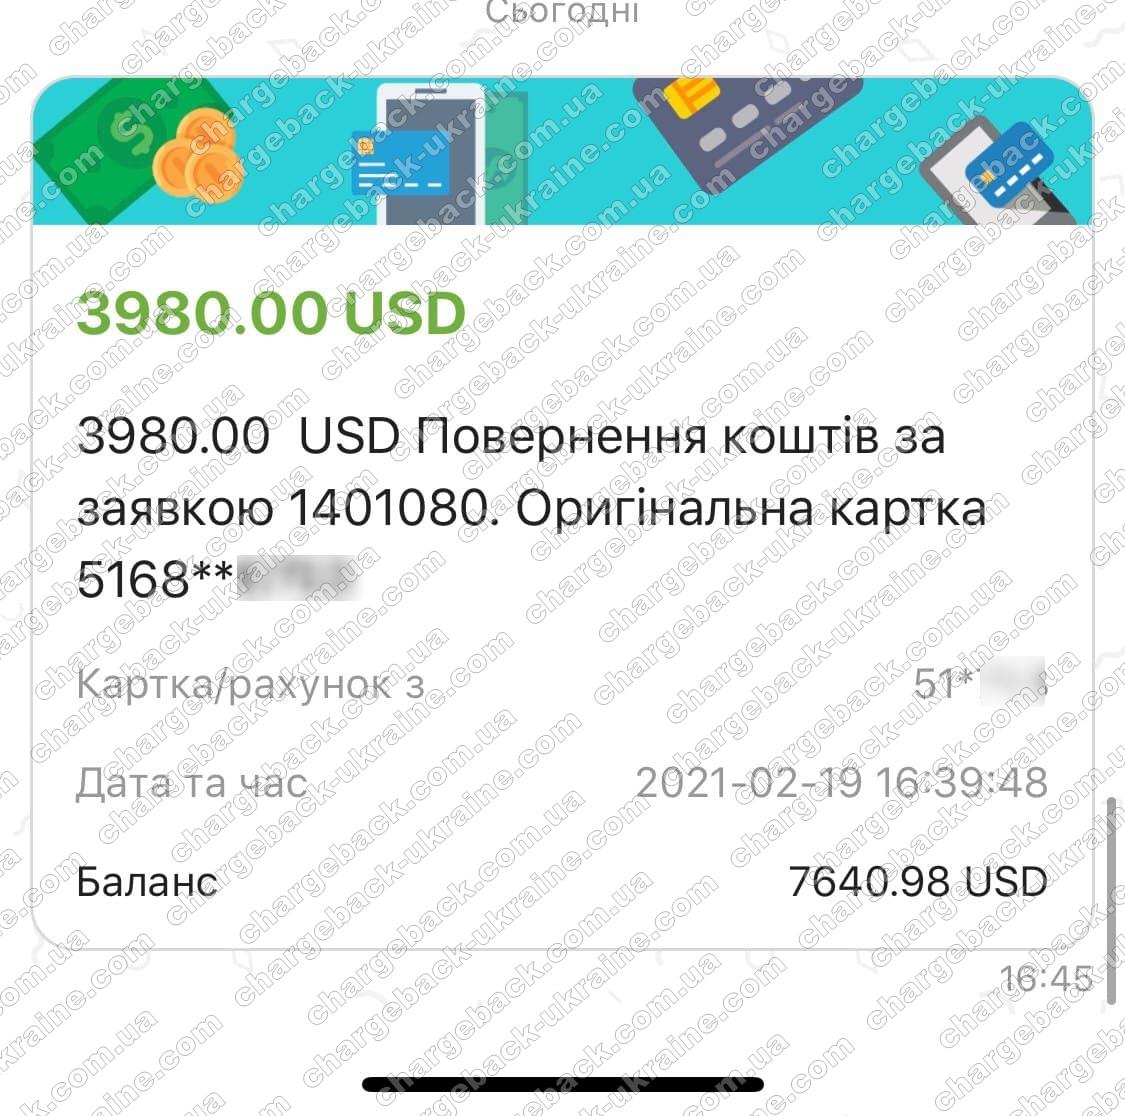 19.02.2021 возврат из TradersHome 3980 USD